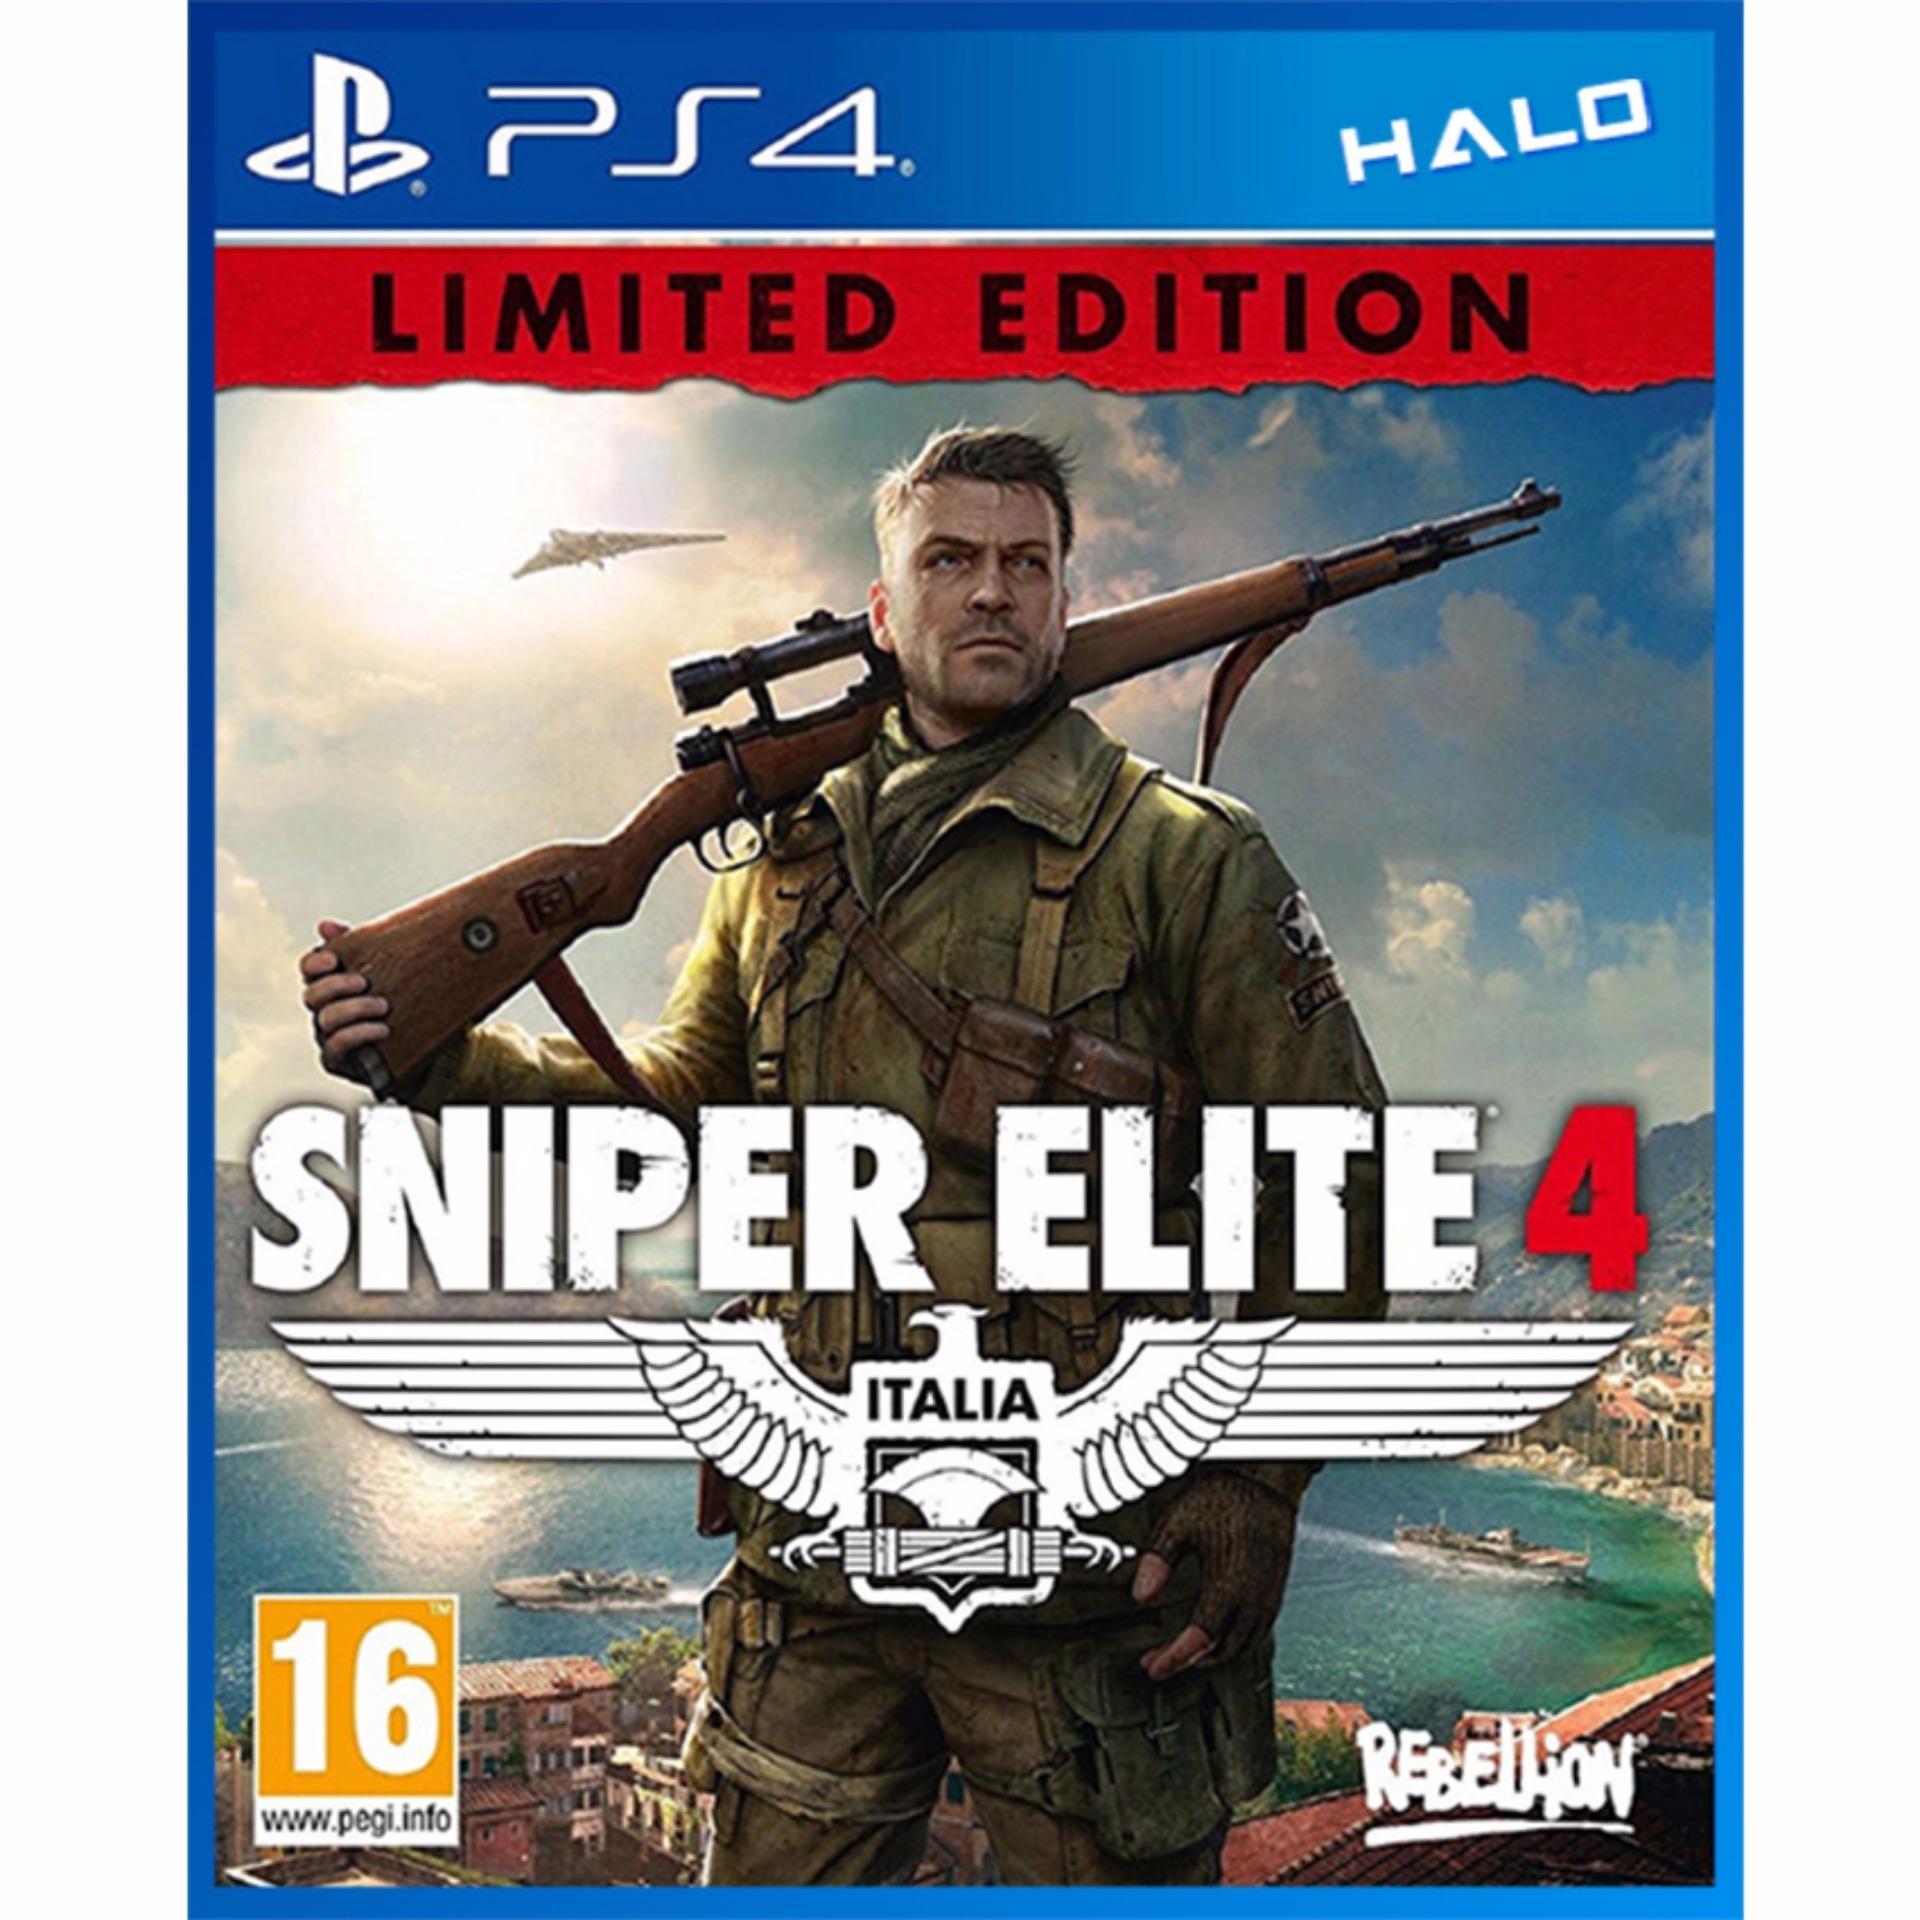 Đĩa Games Ps4 Sniper Elite 4 Limited Edition